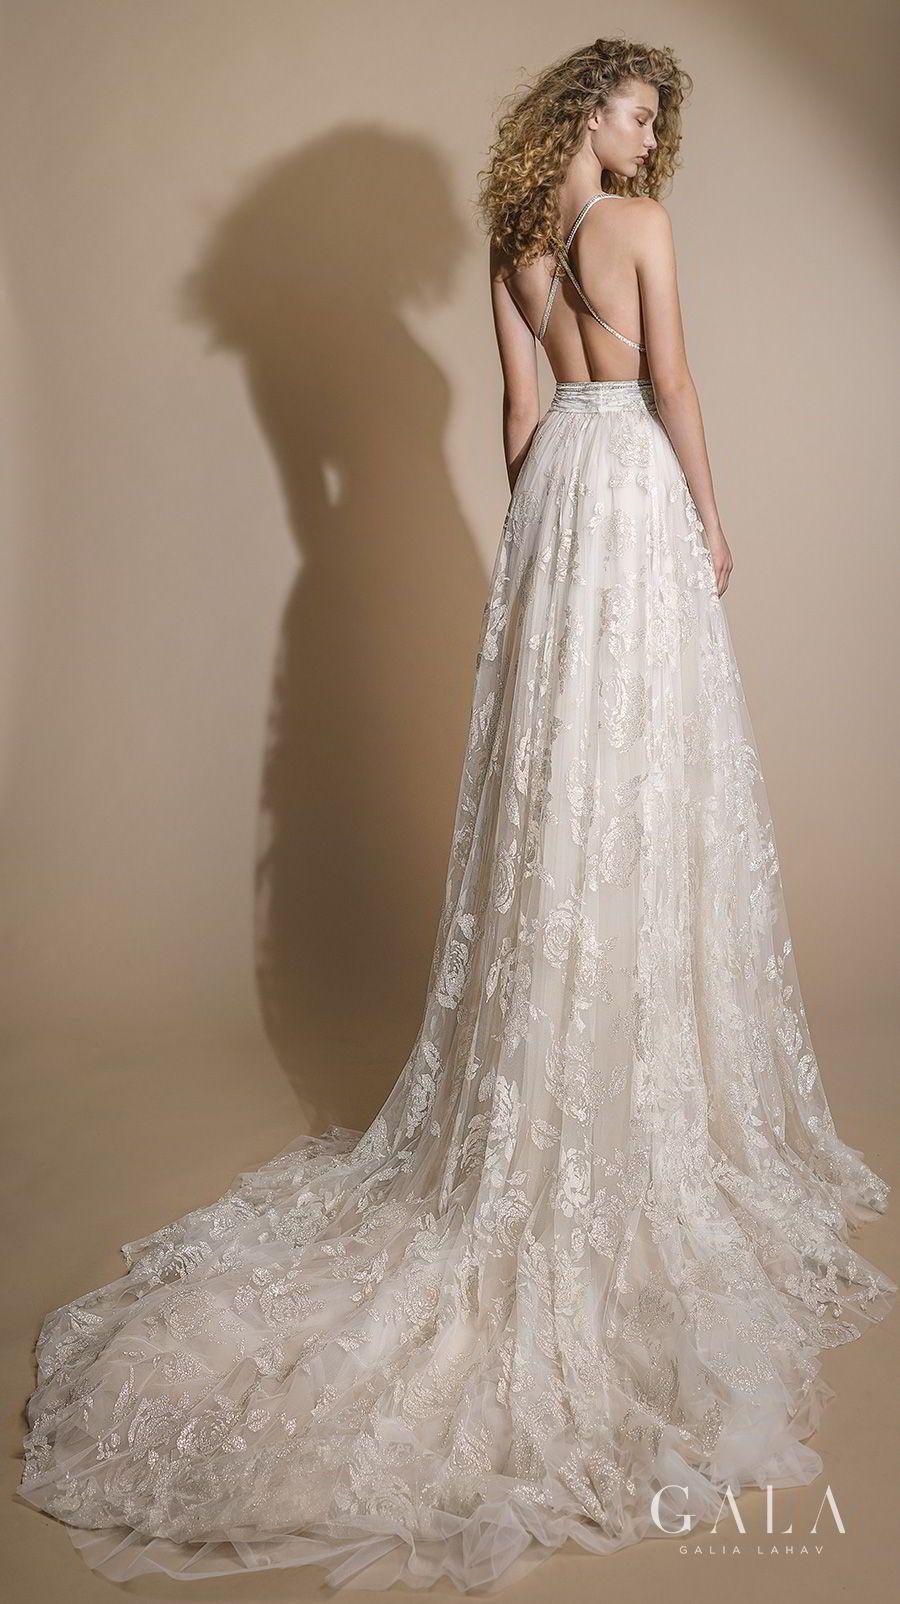 Wedding dress without train  GALA by Galia Lahav Collection No VI u These Wedding Dresses are